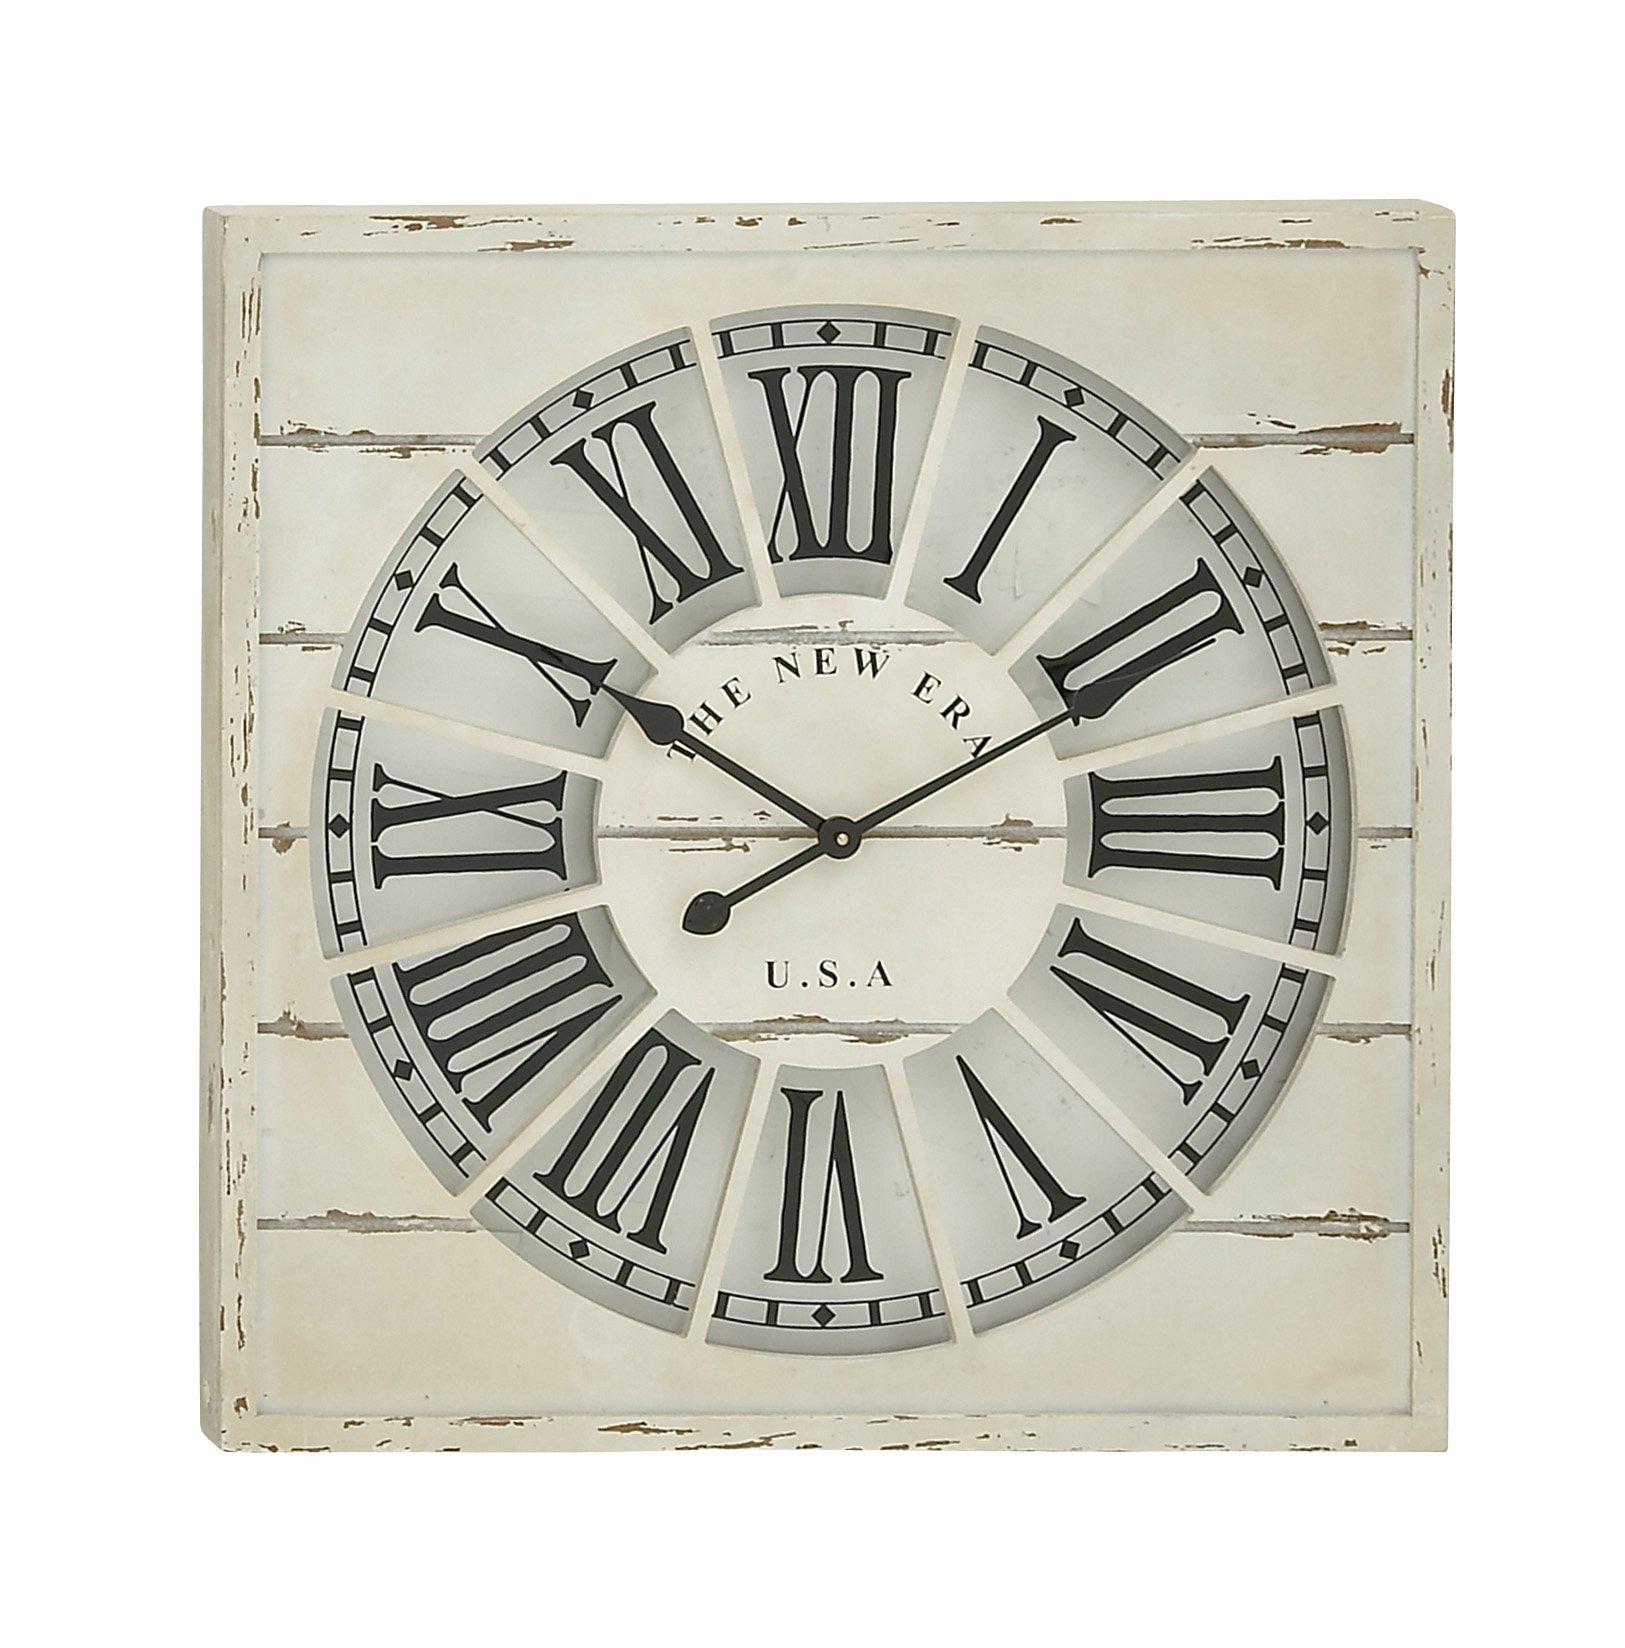 Deco 79 52135 Wood Wall Clock 27'' W, 27'' H